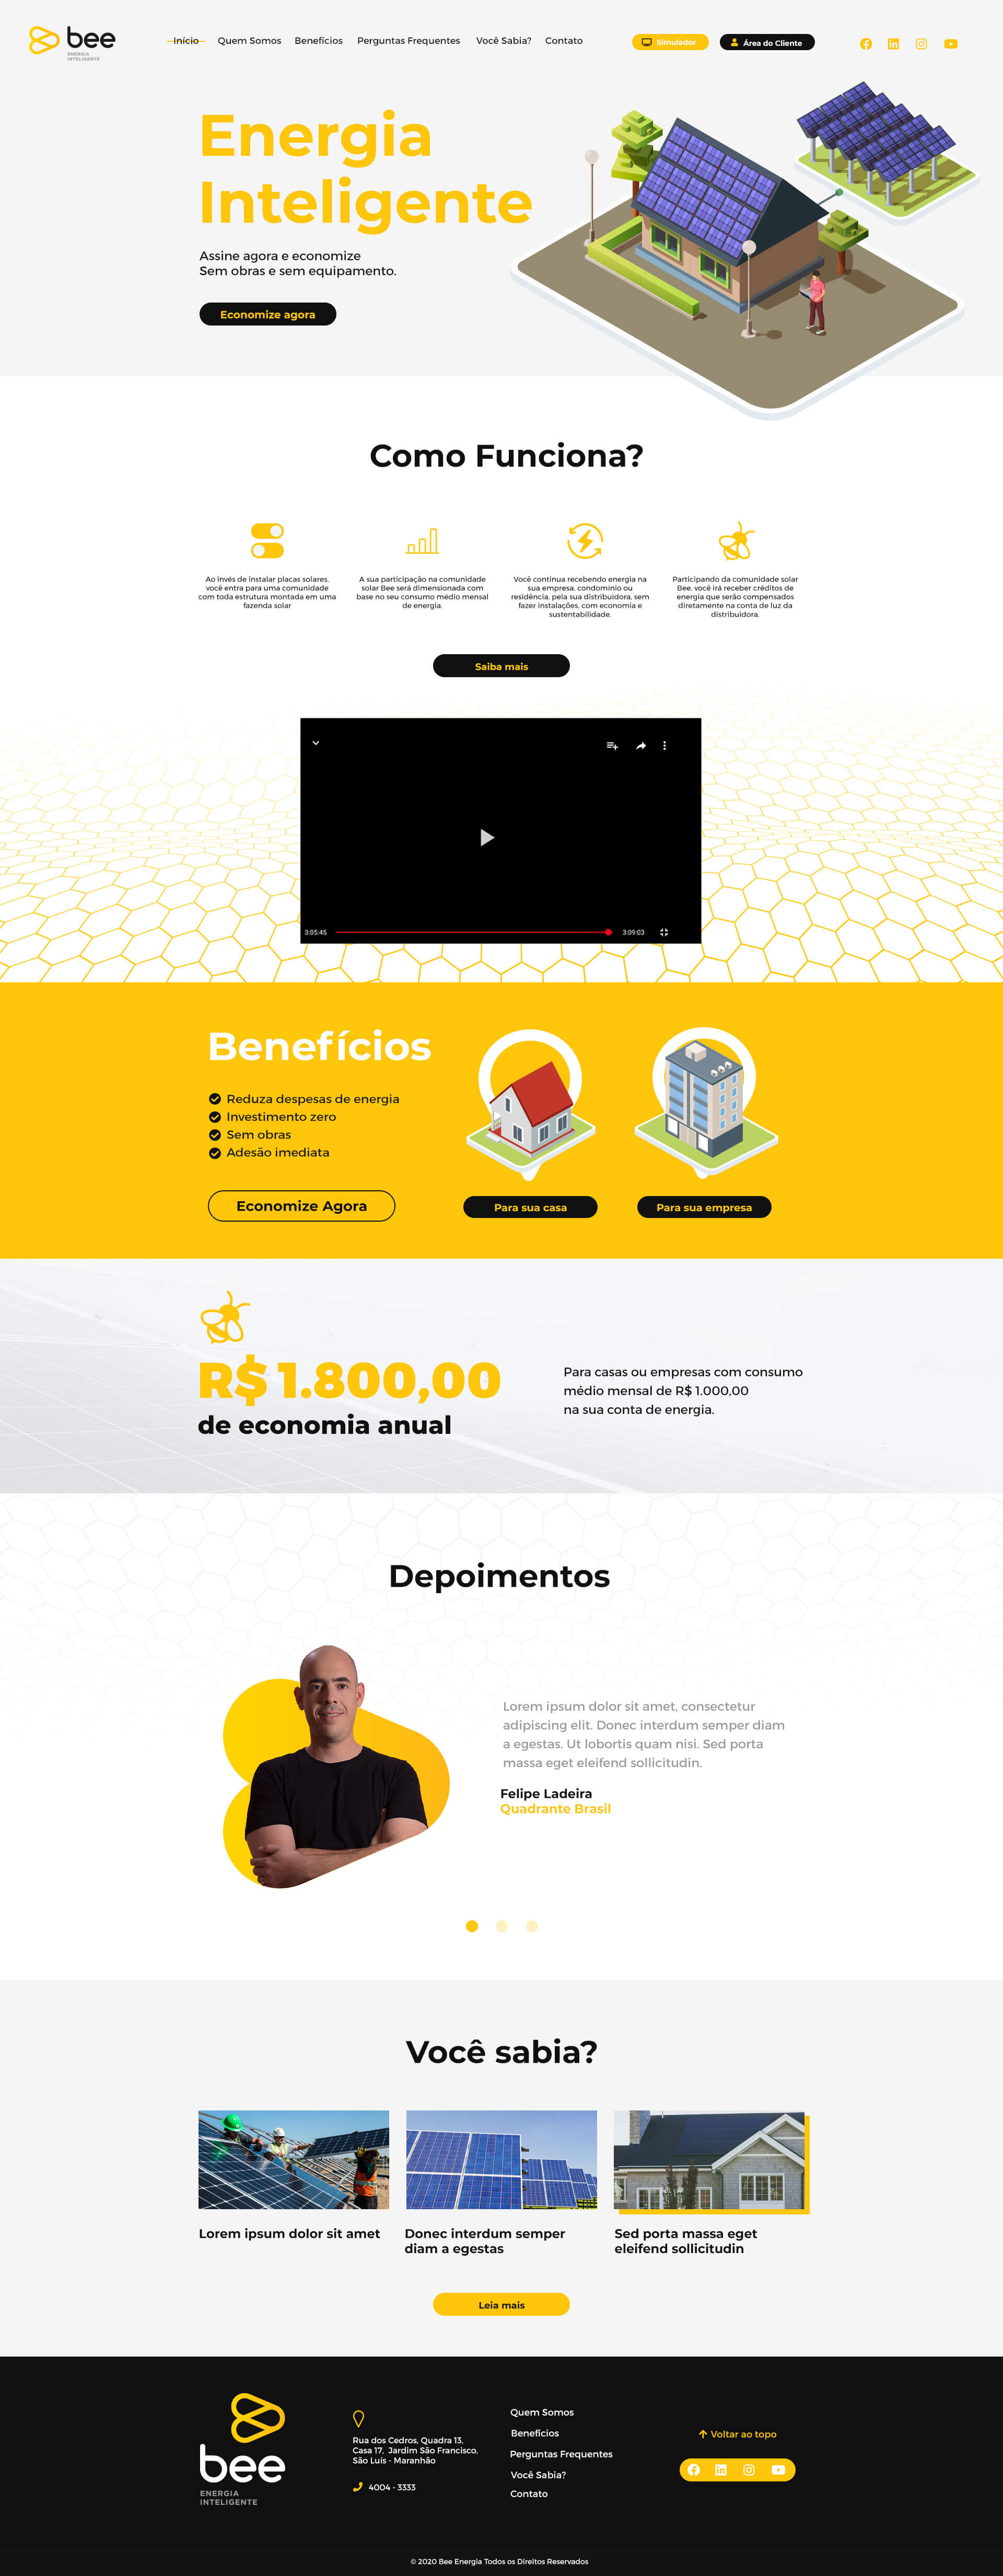 bee-website-full